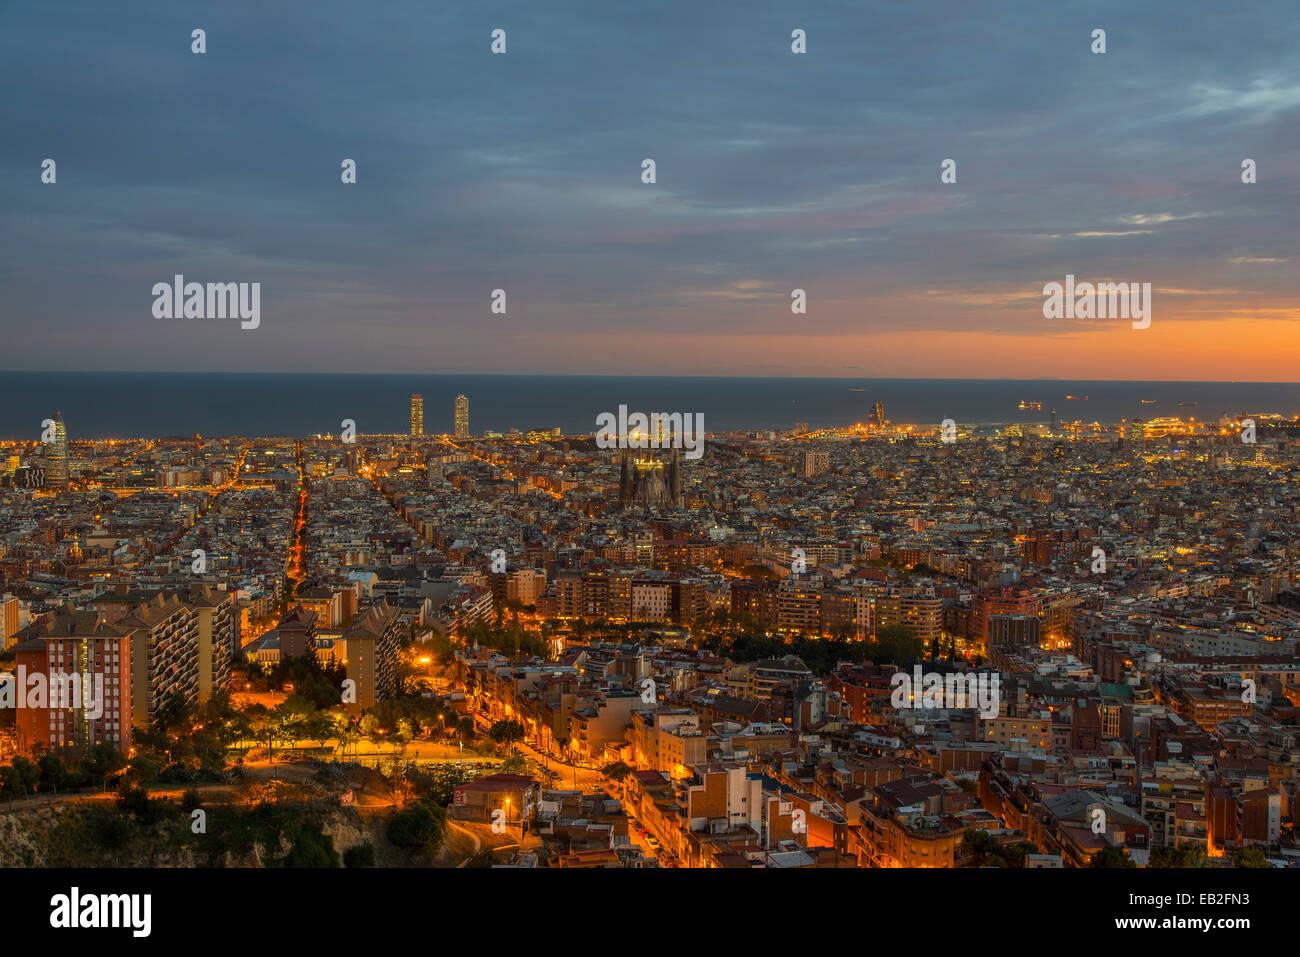 Skyline Sonnenuntergang Stadt, Barcelona, Katalonien, Spanien Stockfoto